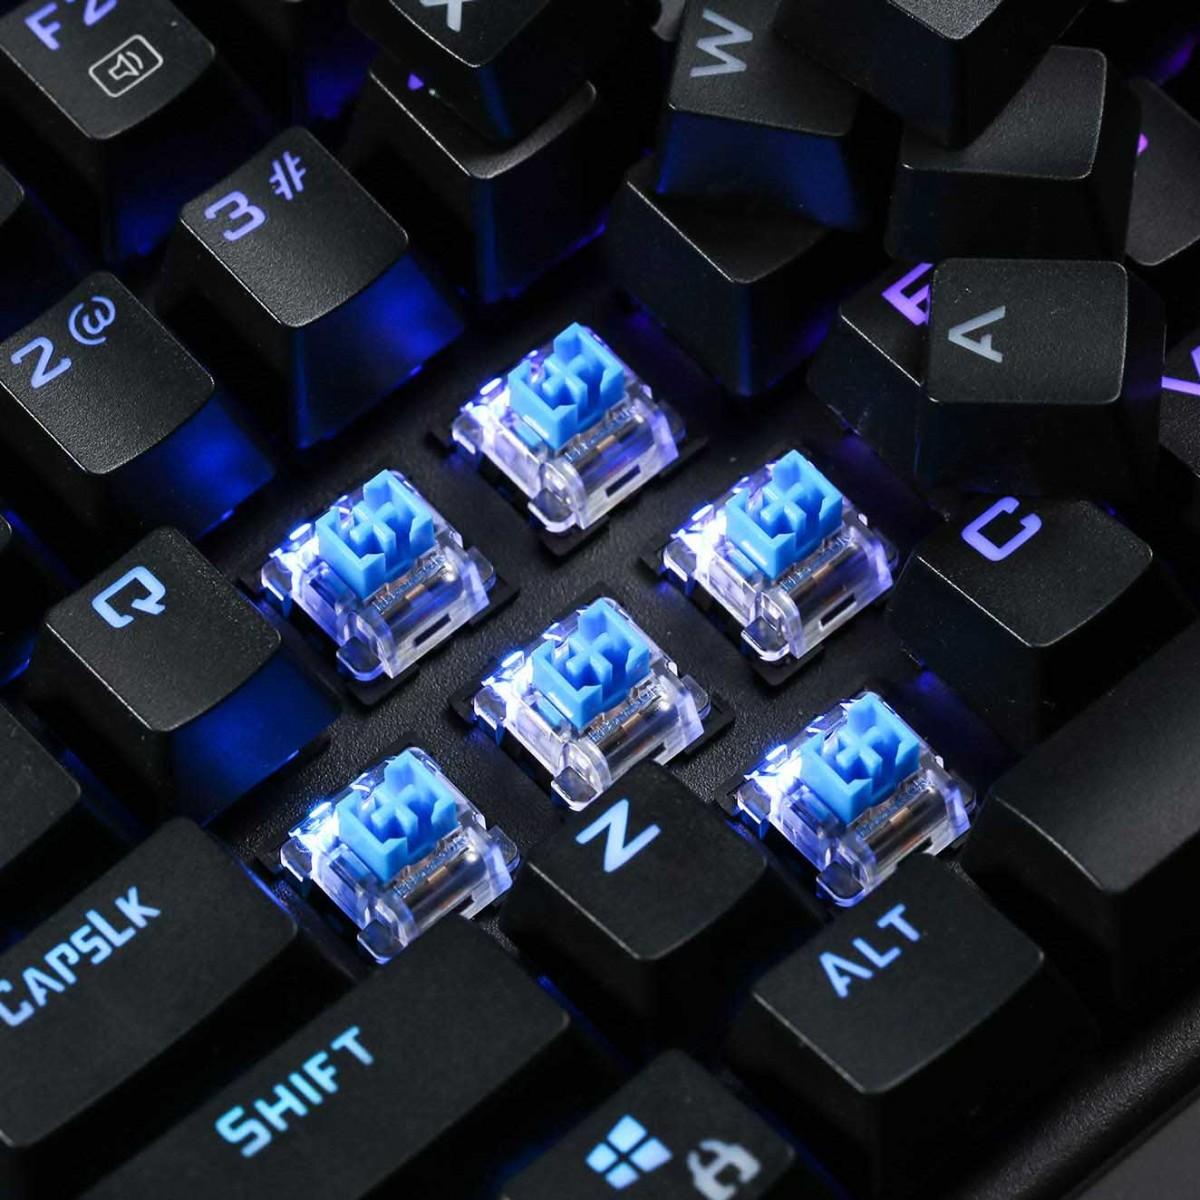 Teclado Mecânico Gamer Redragon K587 Magic-Wand Pro RGB, Switch Blue, Black, ABNT, K587RGB-PRO